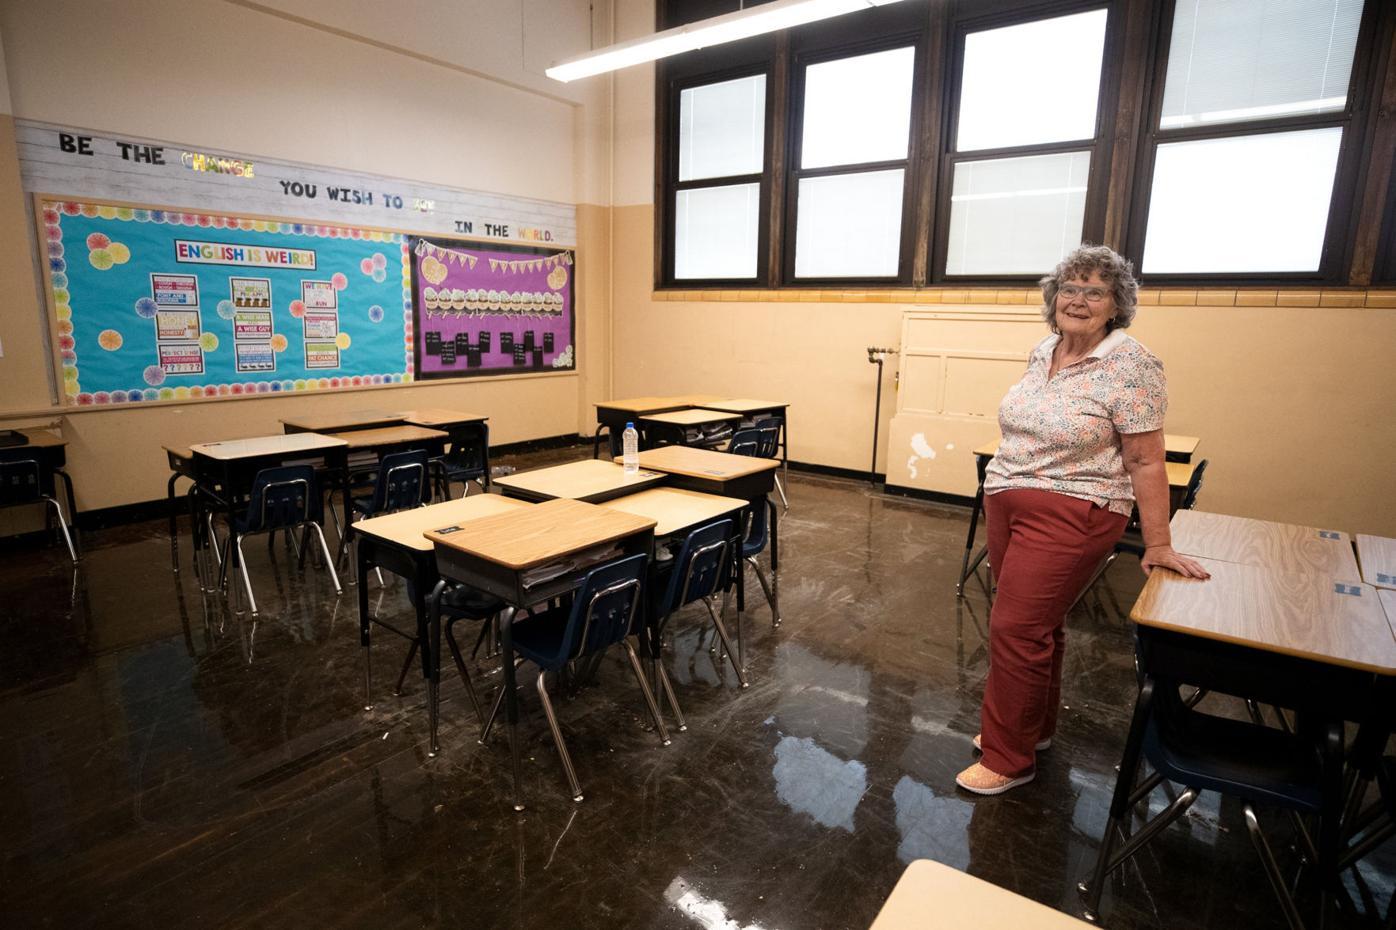 Northeast Intermediate School remediation work tour